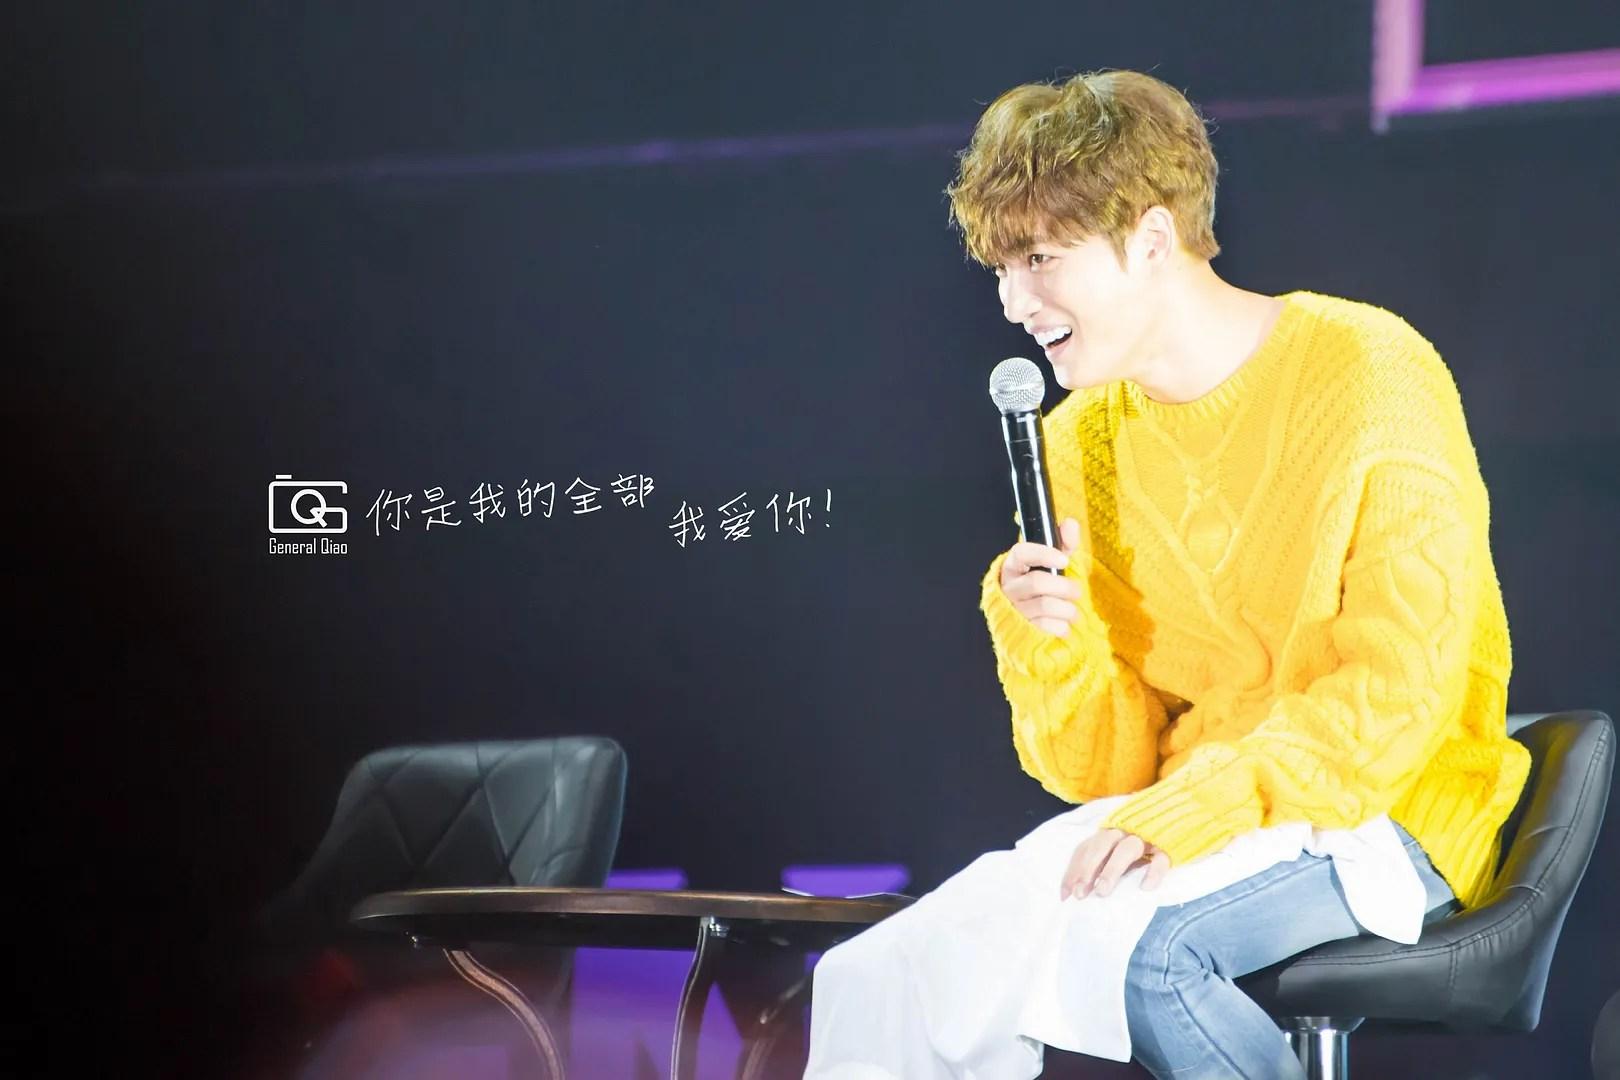 photo General_Qiao_19.jpg